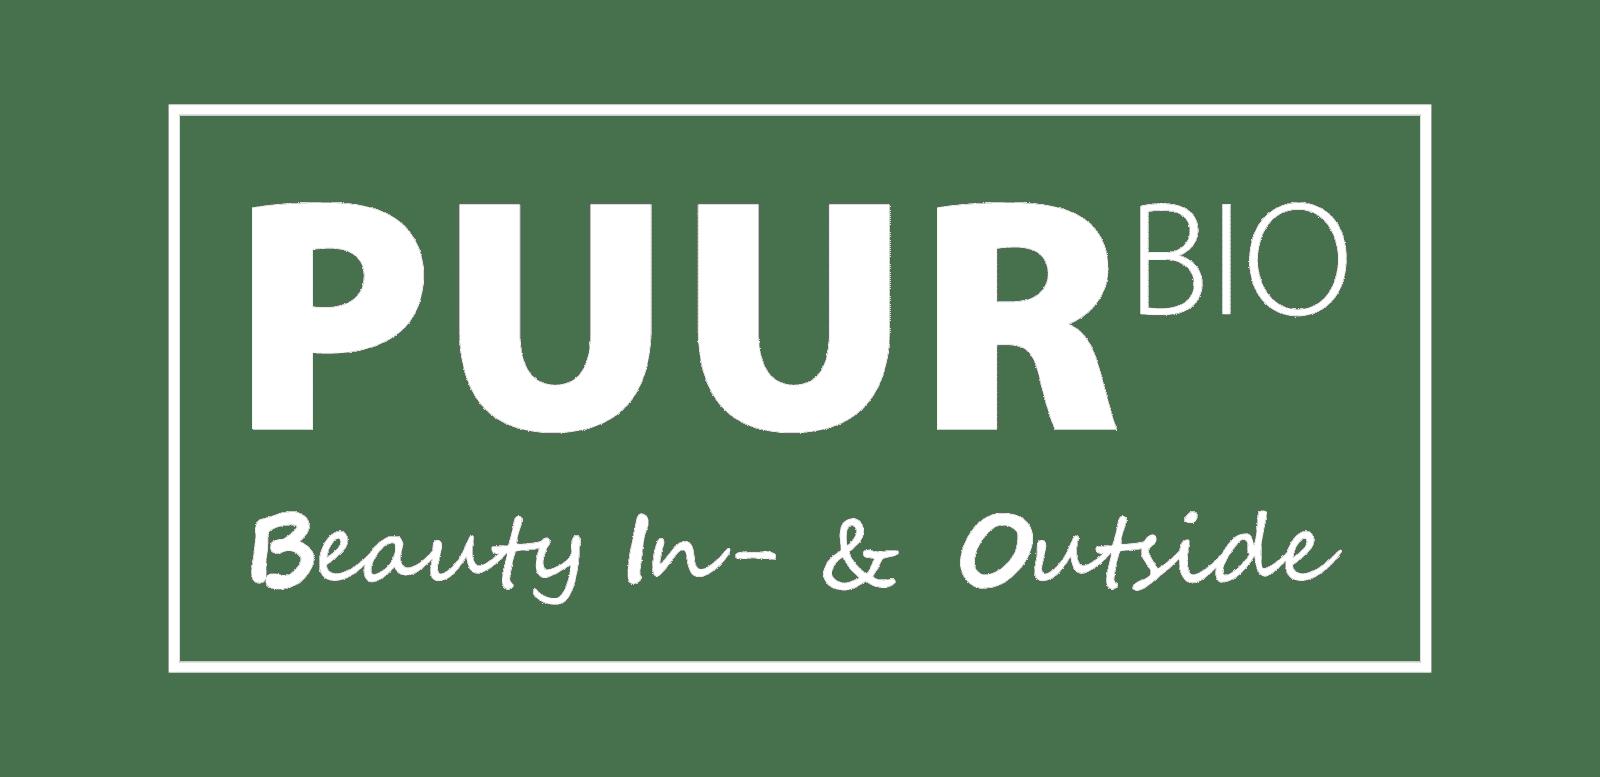 PUUR Bio_DEF2